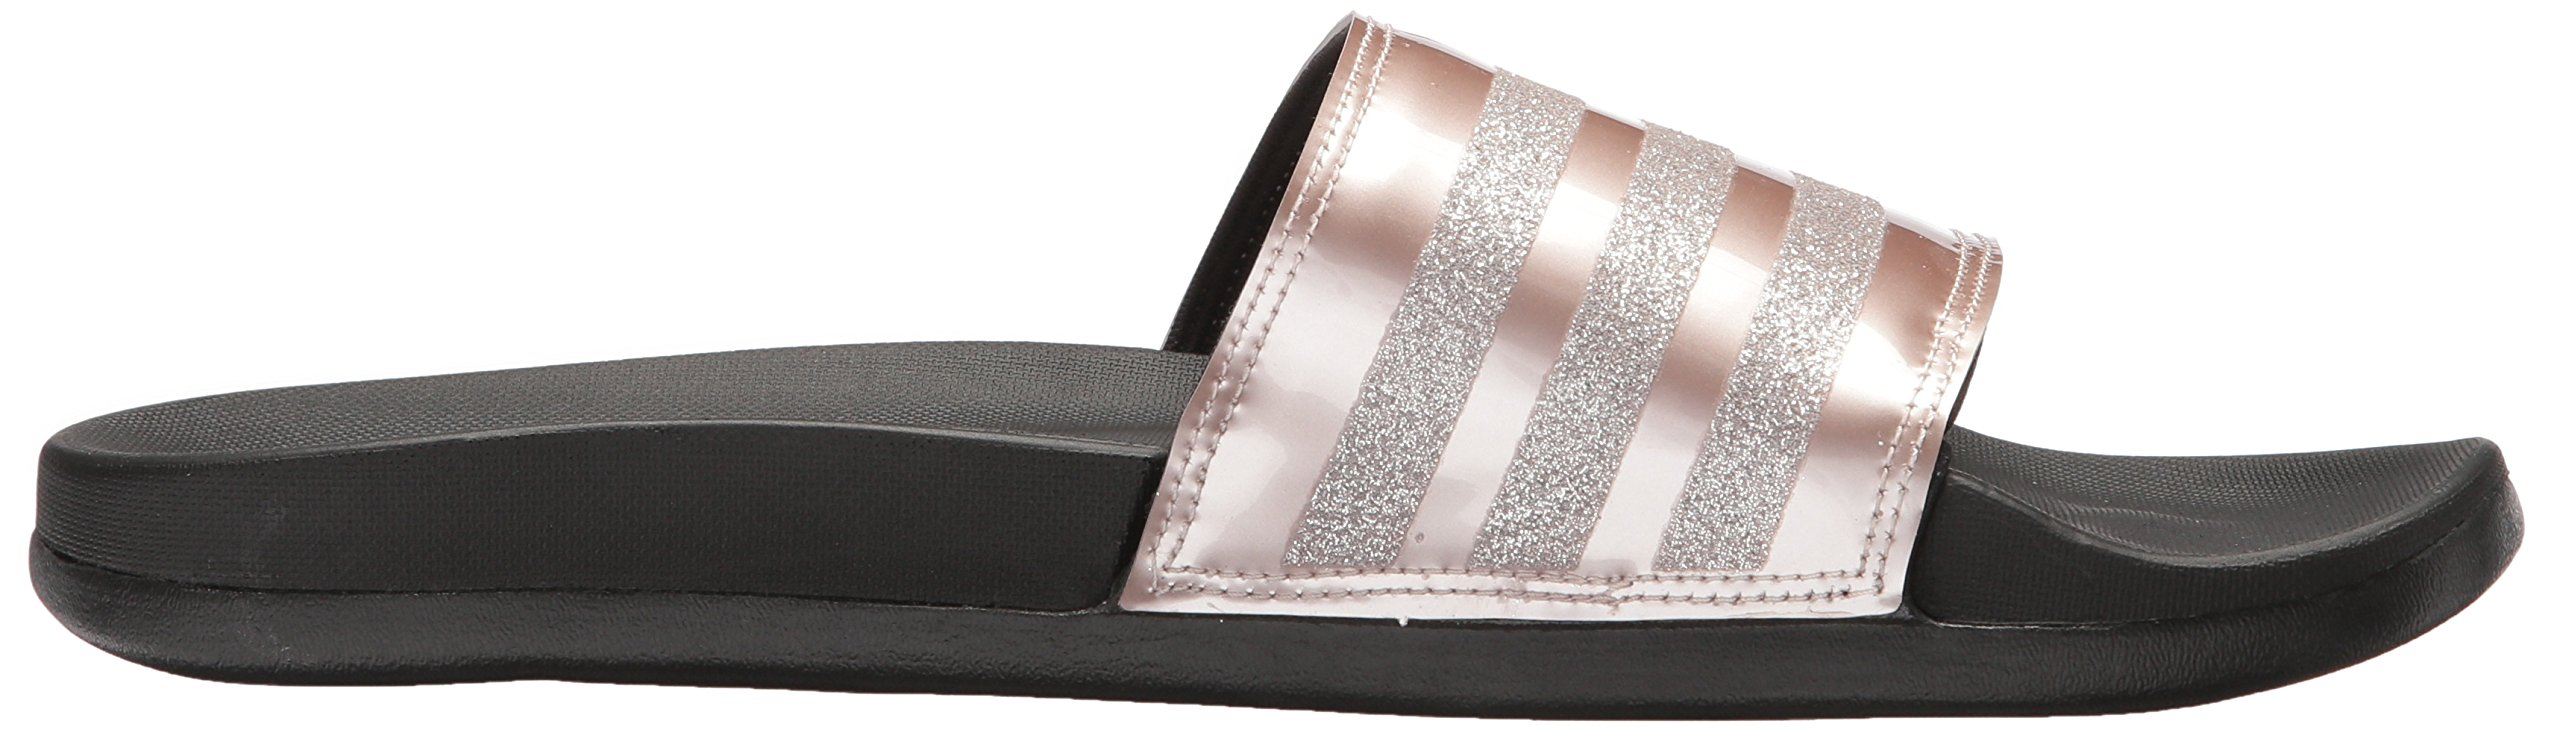 adidas Performance Women's Adilette CF+ Explorer W Sport Sandal, Vapour Grey Met, Vapour Grey Met.Fabric, Core Black, 9 M US by adidas (Image #7)